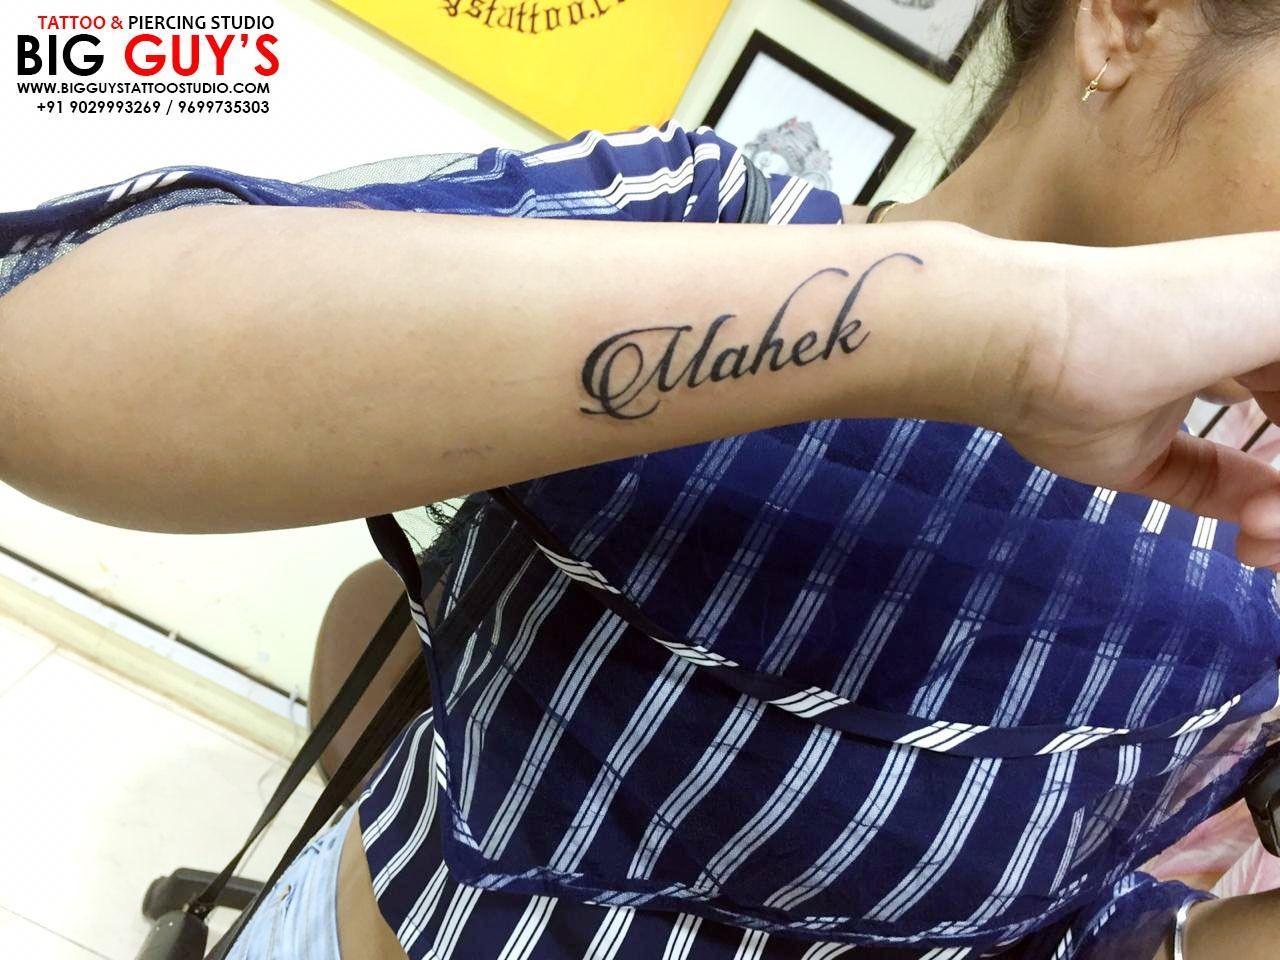 Mahek Tattoo Done By Big Guys Tattoo Studio Name Tattoos On Wrist Tattoos For Guys Heartbeat Tattoo On Wrist